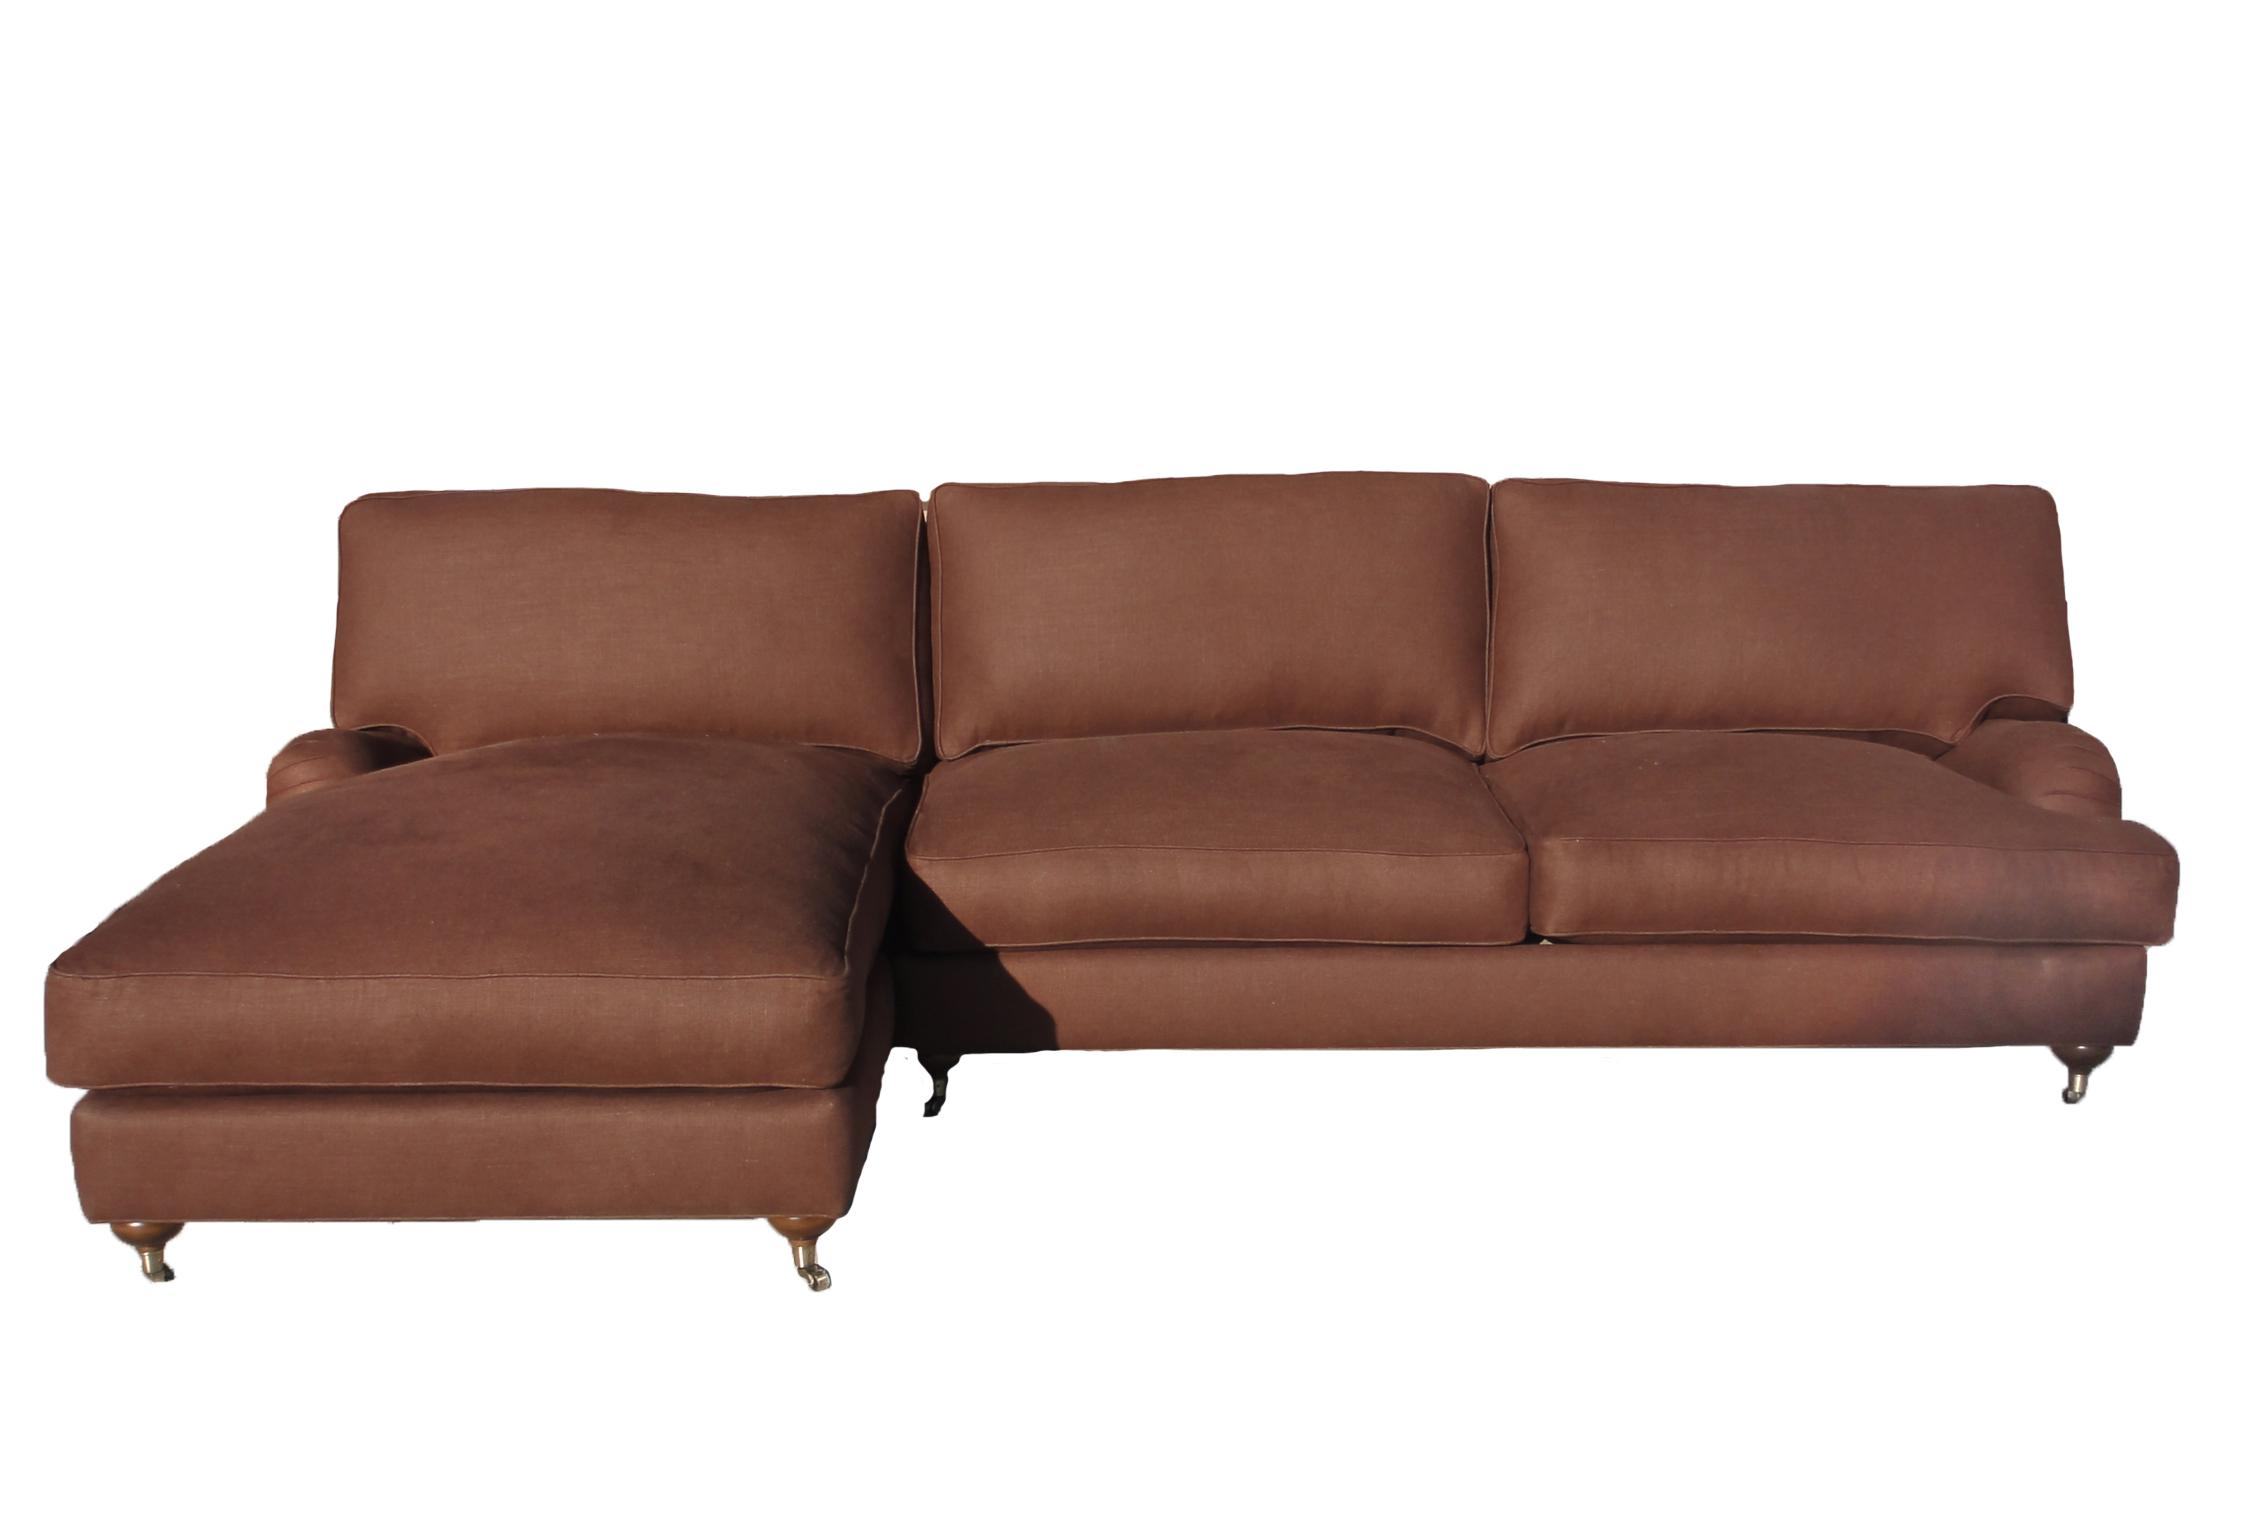 vWhitney Sectional santa barbara design center santa barbara sofa couch furniture-